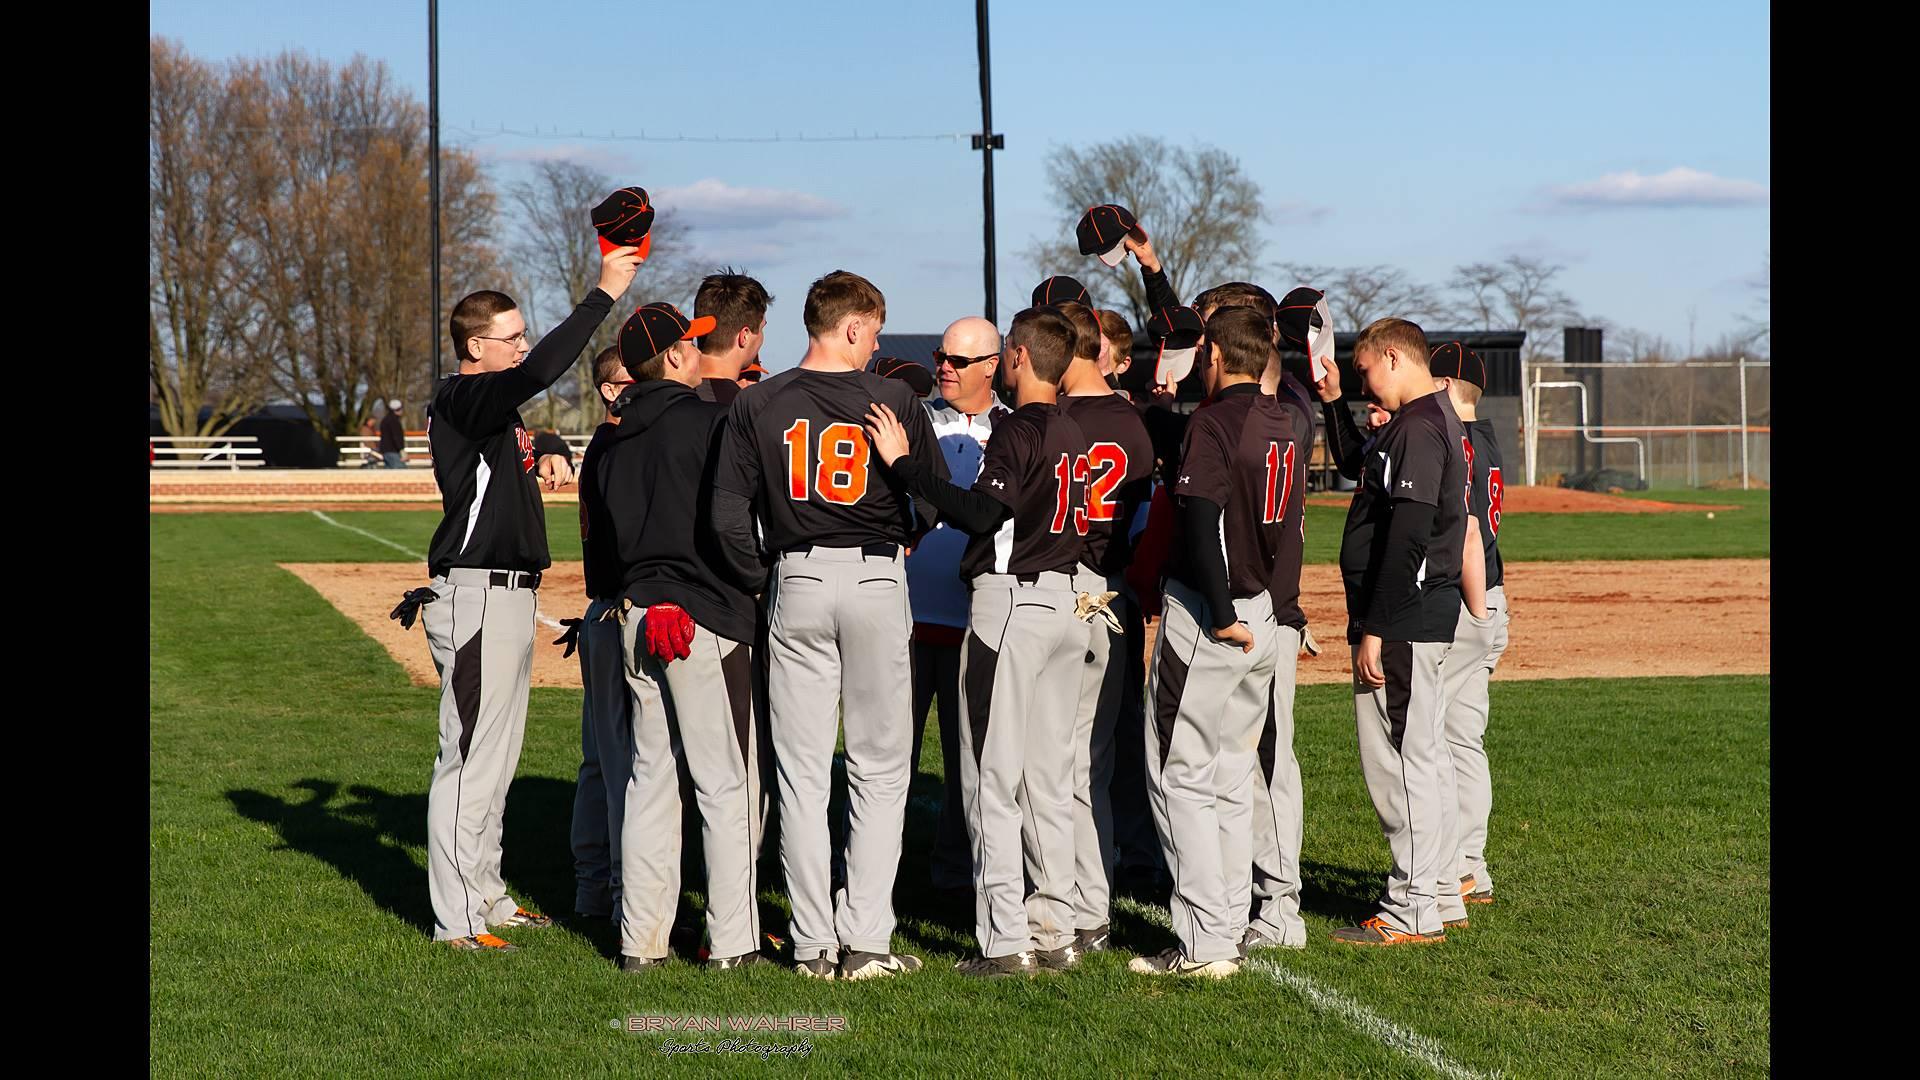 Baseball team group huddle with coach